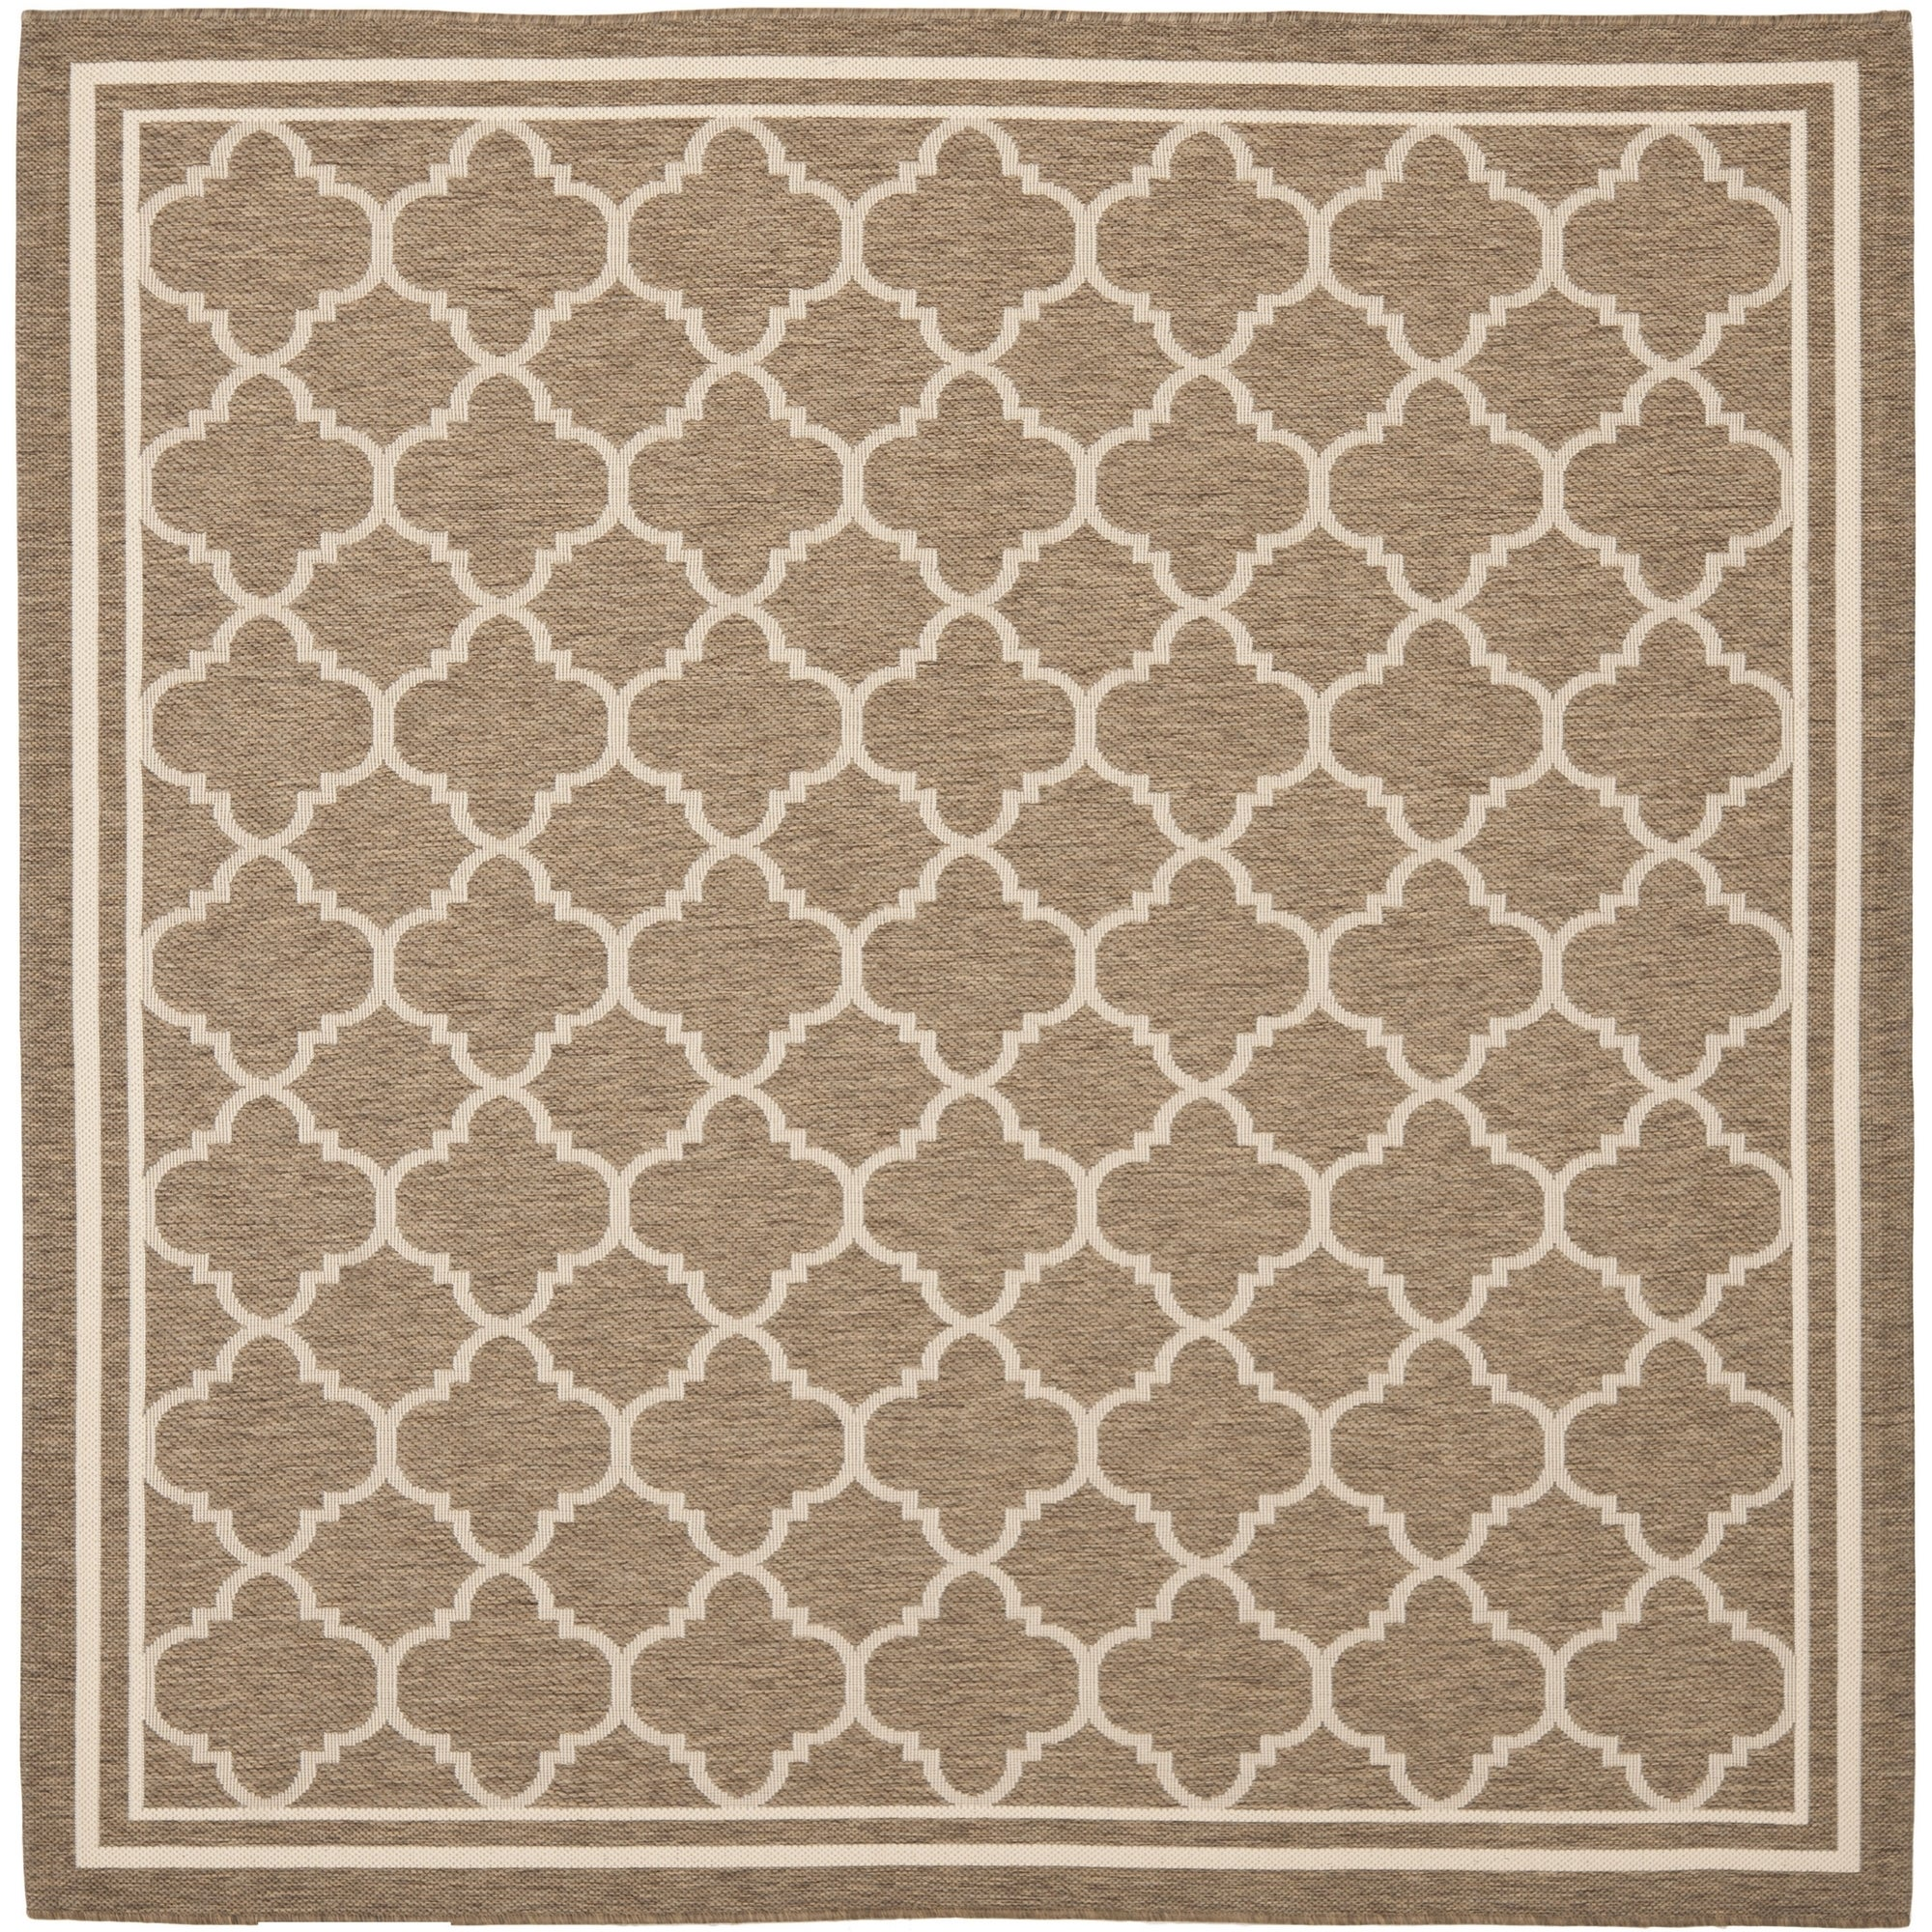 Safavieh Indoor/outdoor Courtyard Brown/bone Round Diamond Rug (710 Square)